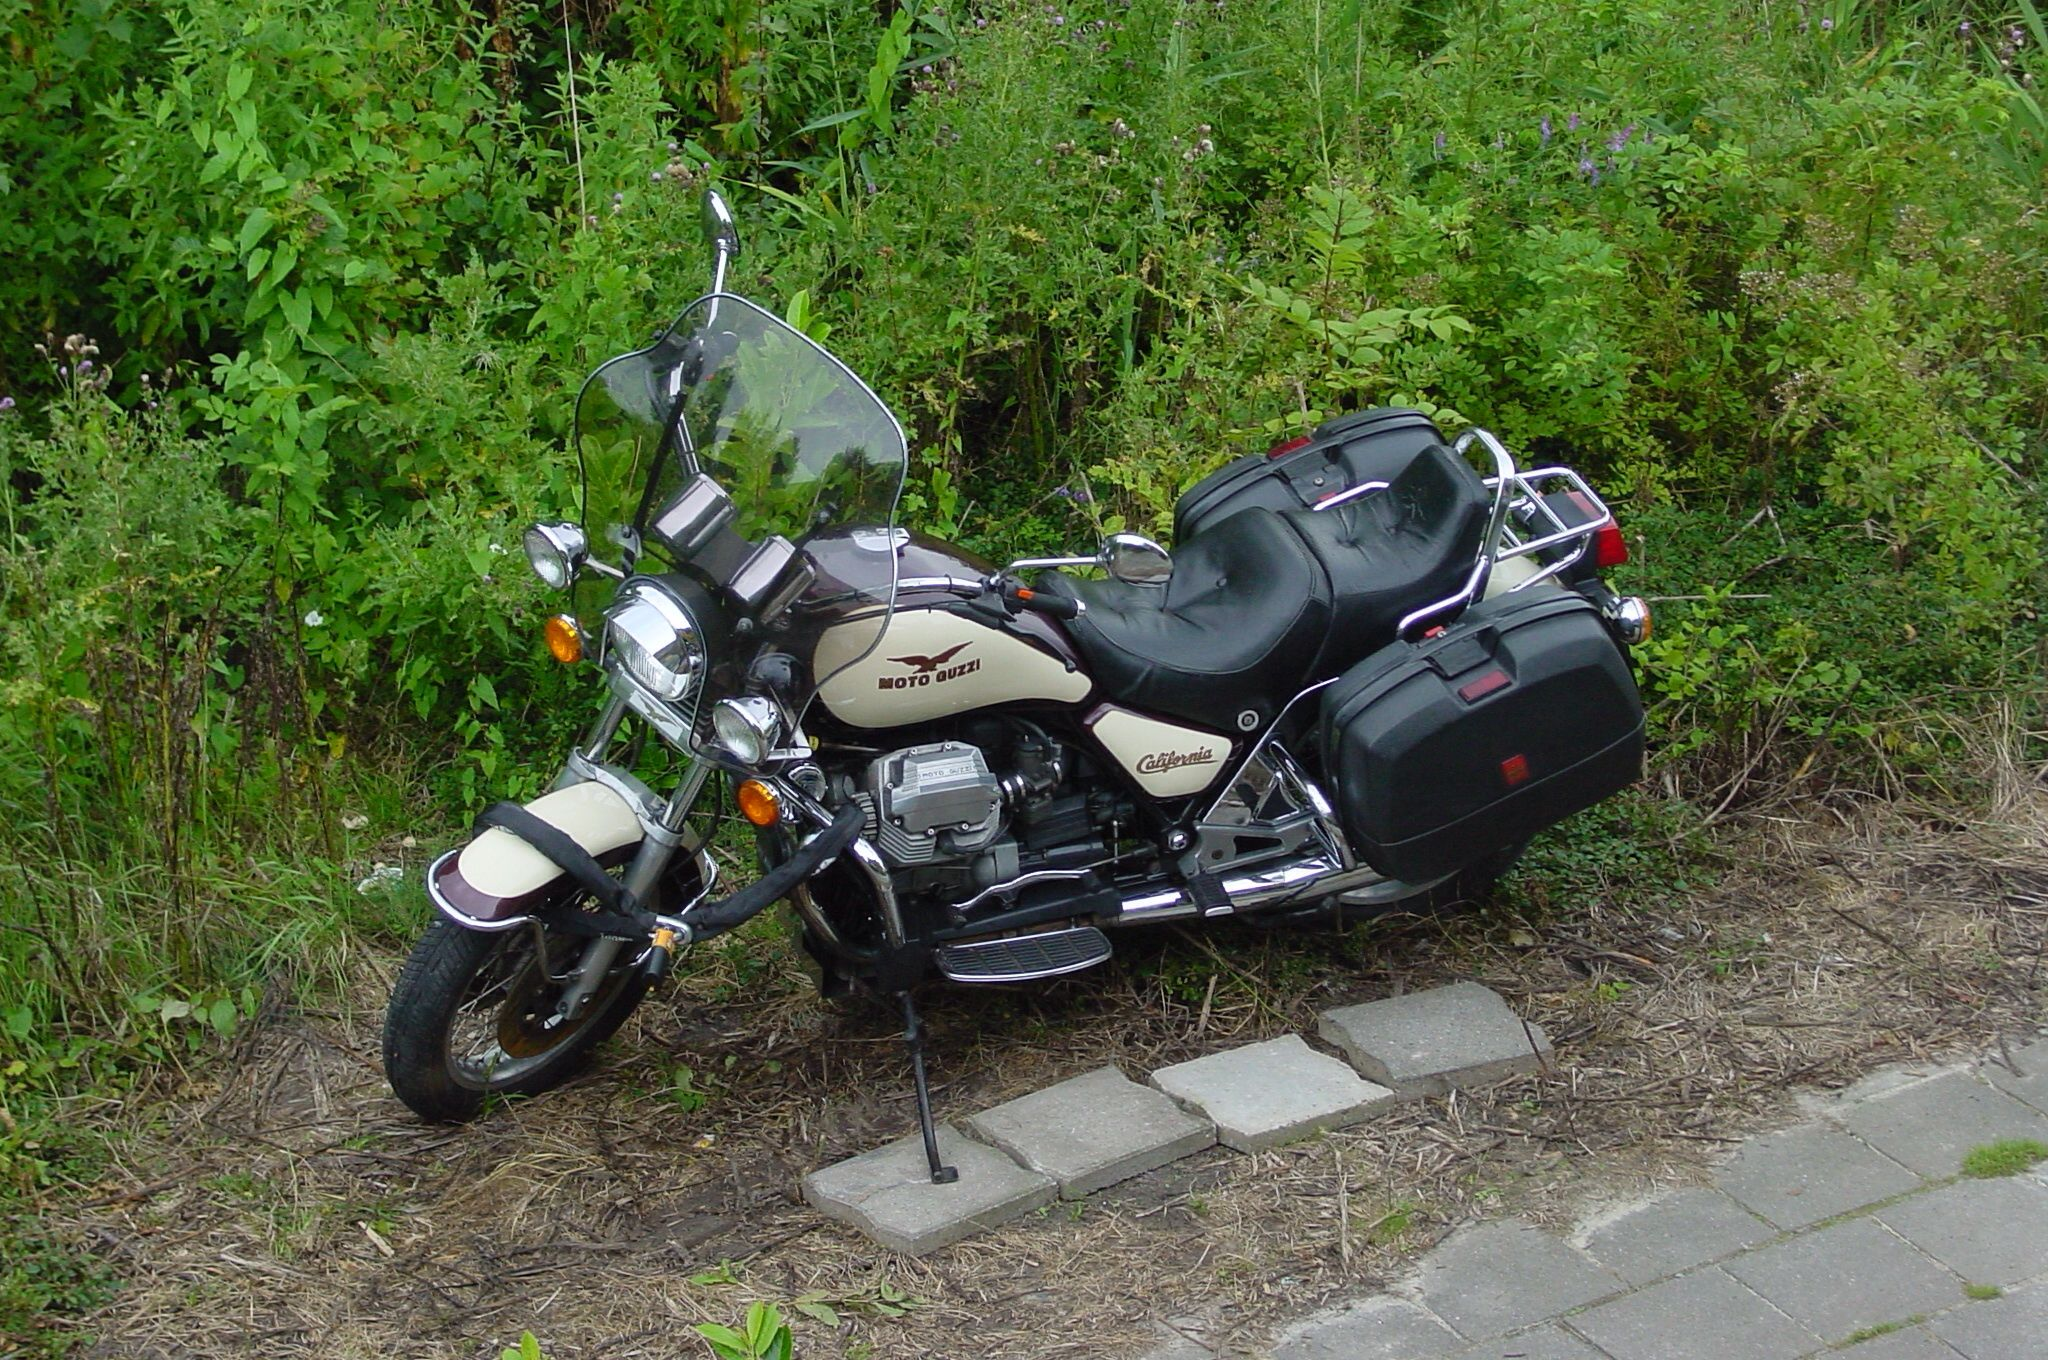 Moto Guzzi California III Moto guzzi california, Moto